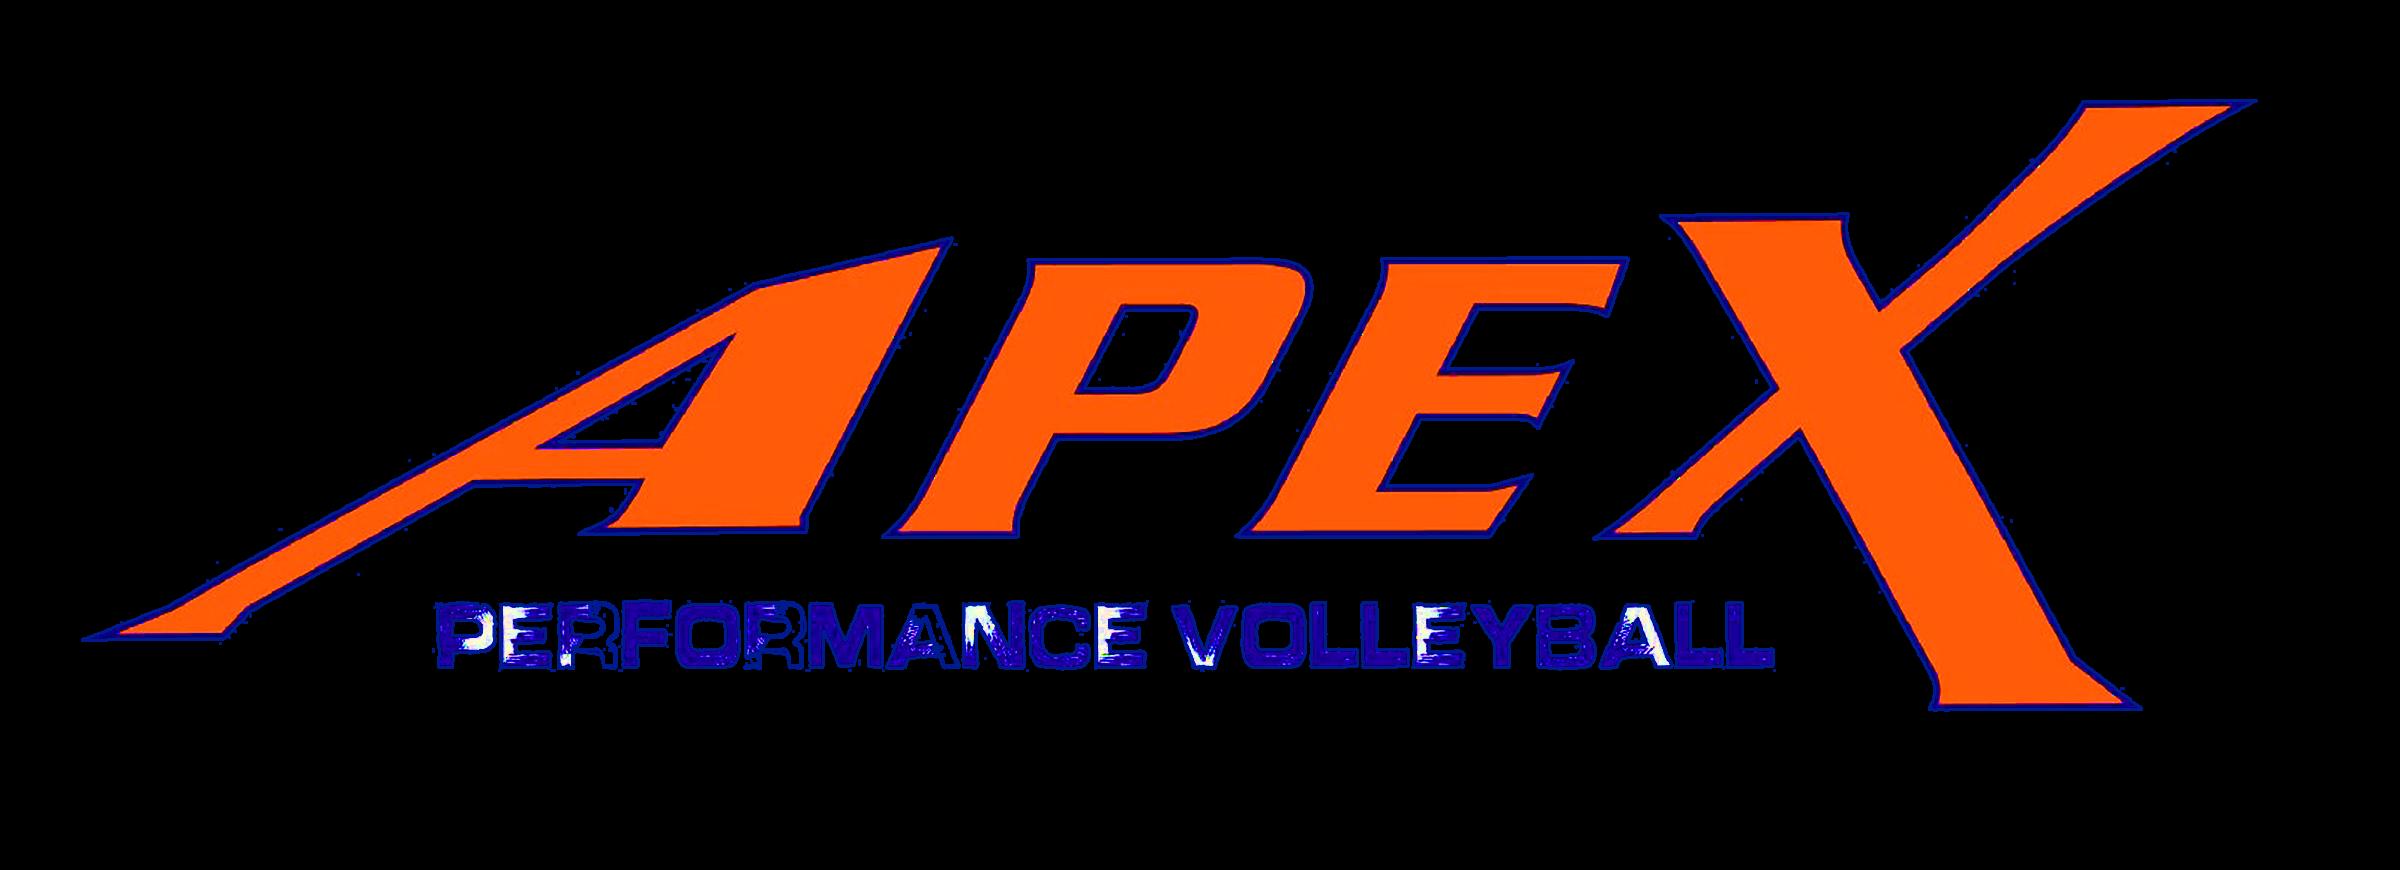 Apex logo 1